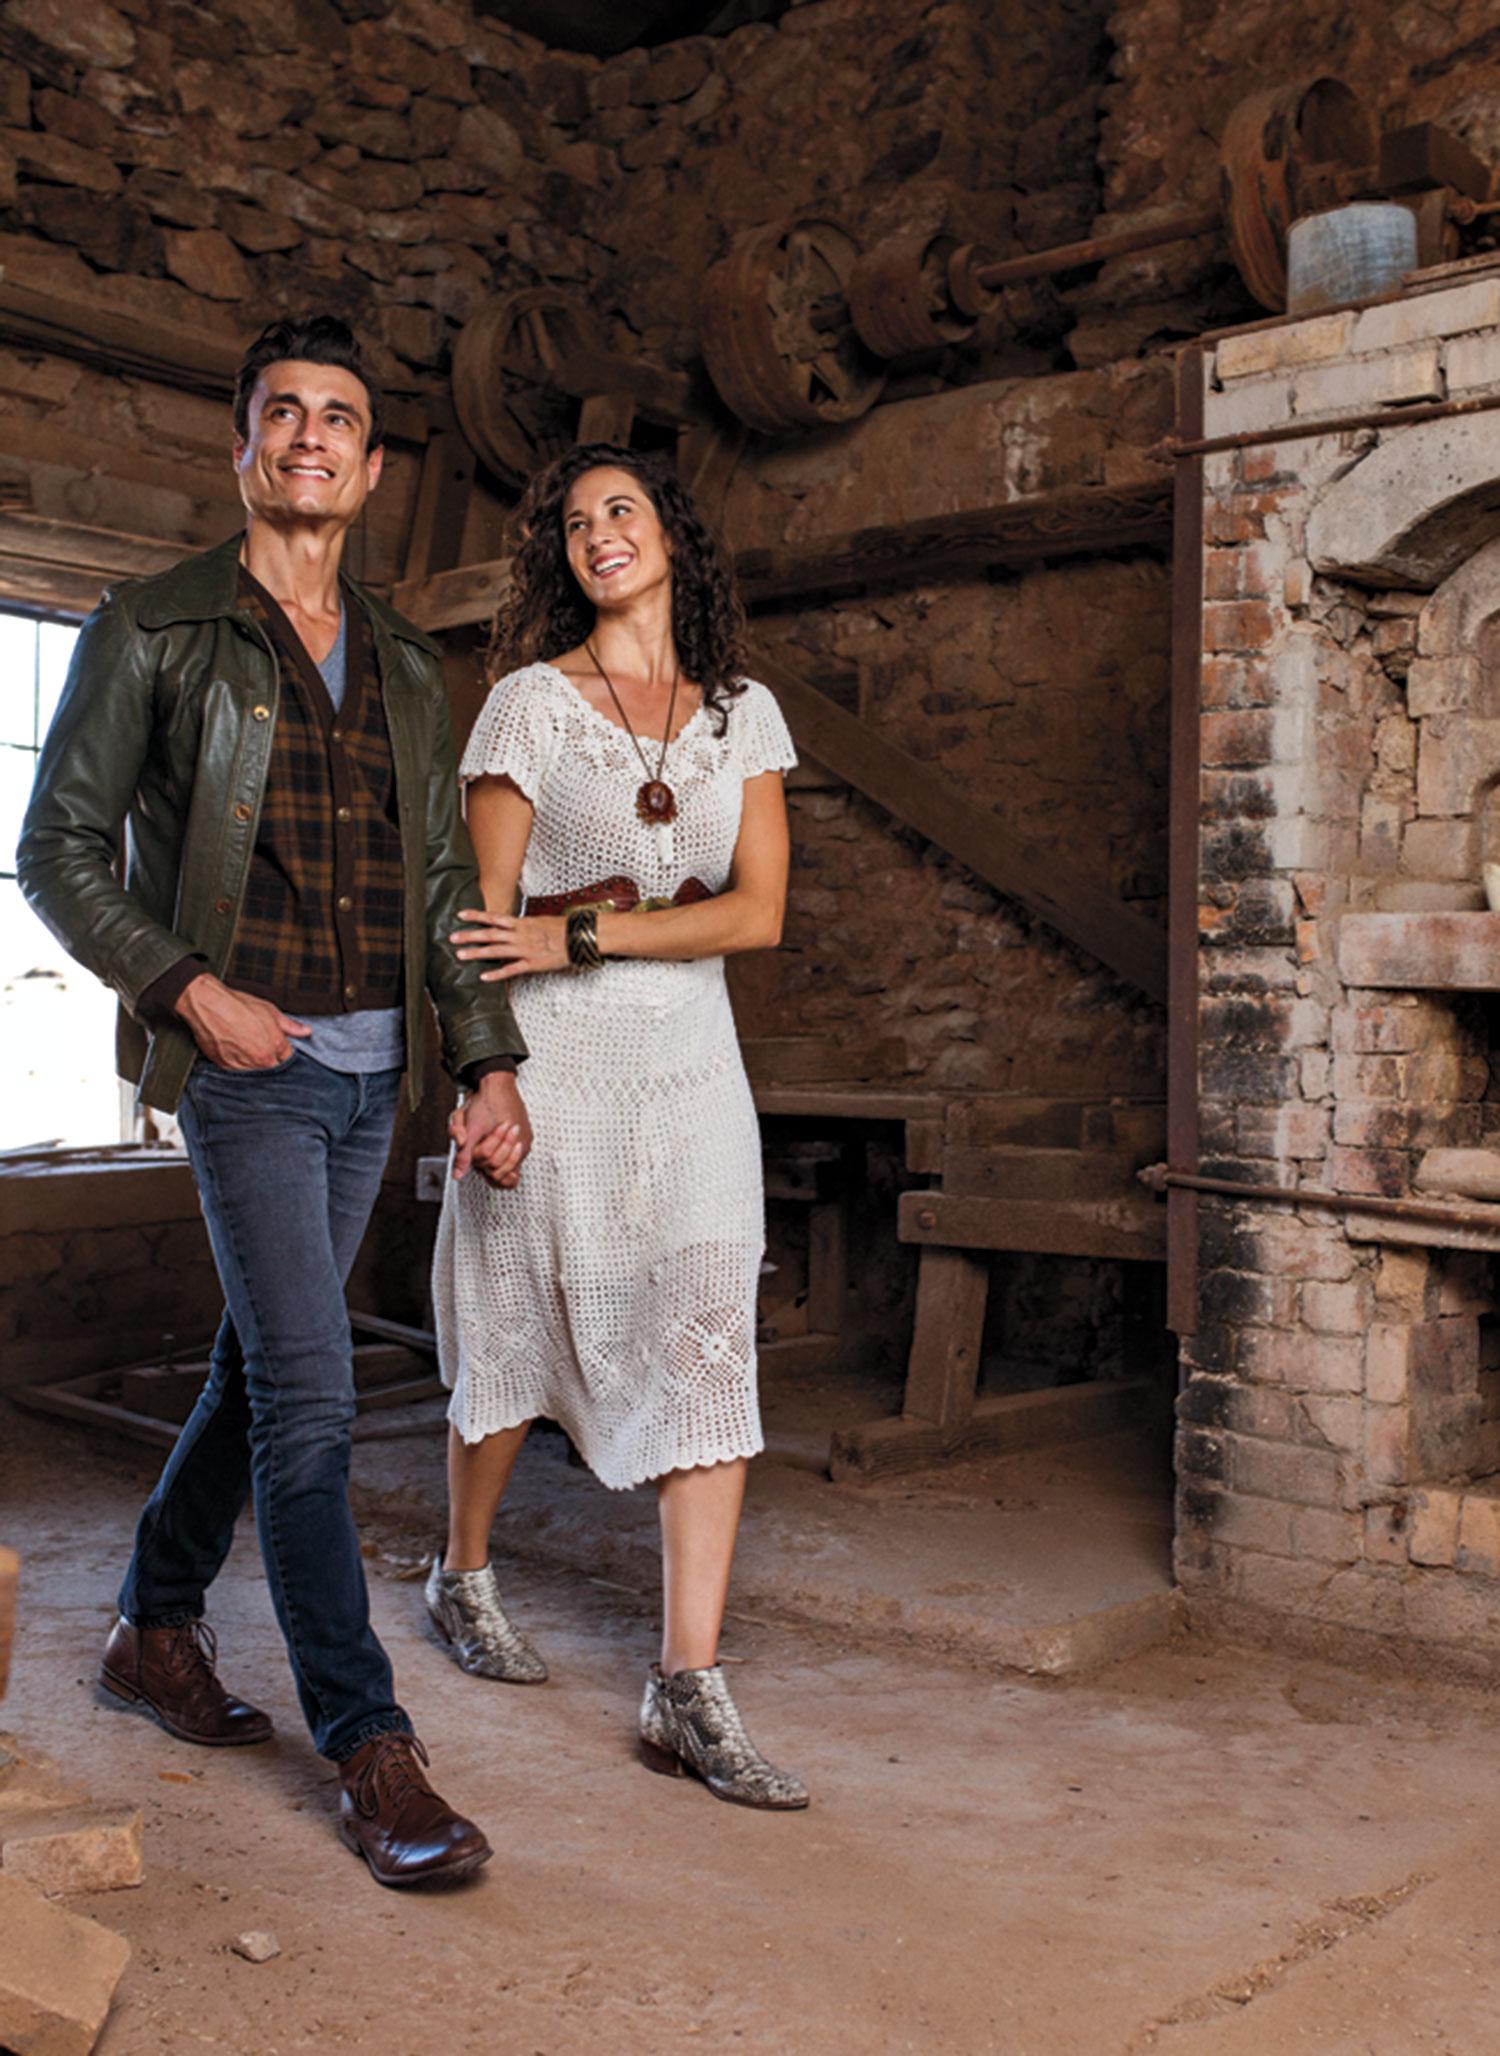 Photos by Blake Bonillas; models: Ashley Habermel; David Thompson; historic photo courtesy Arizona Historical Society